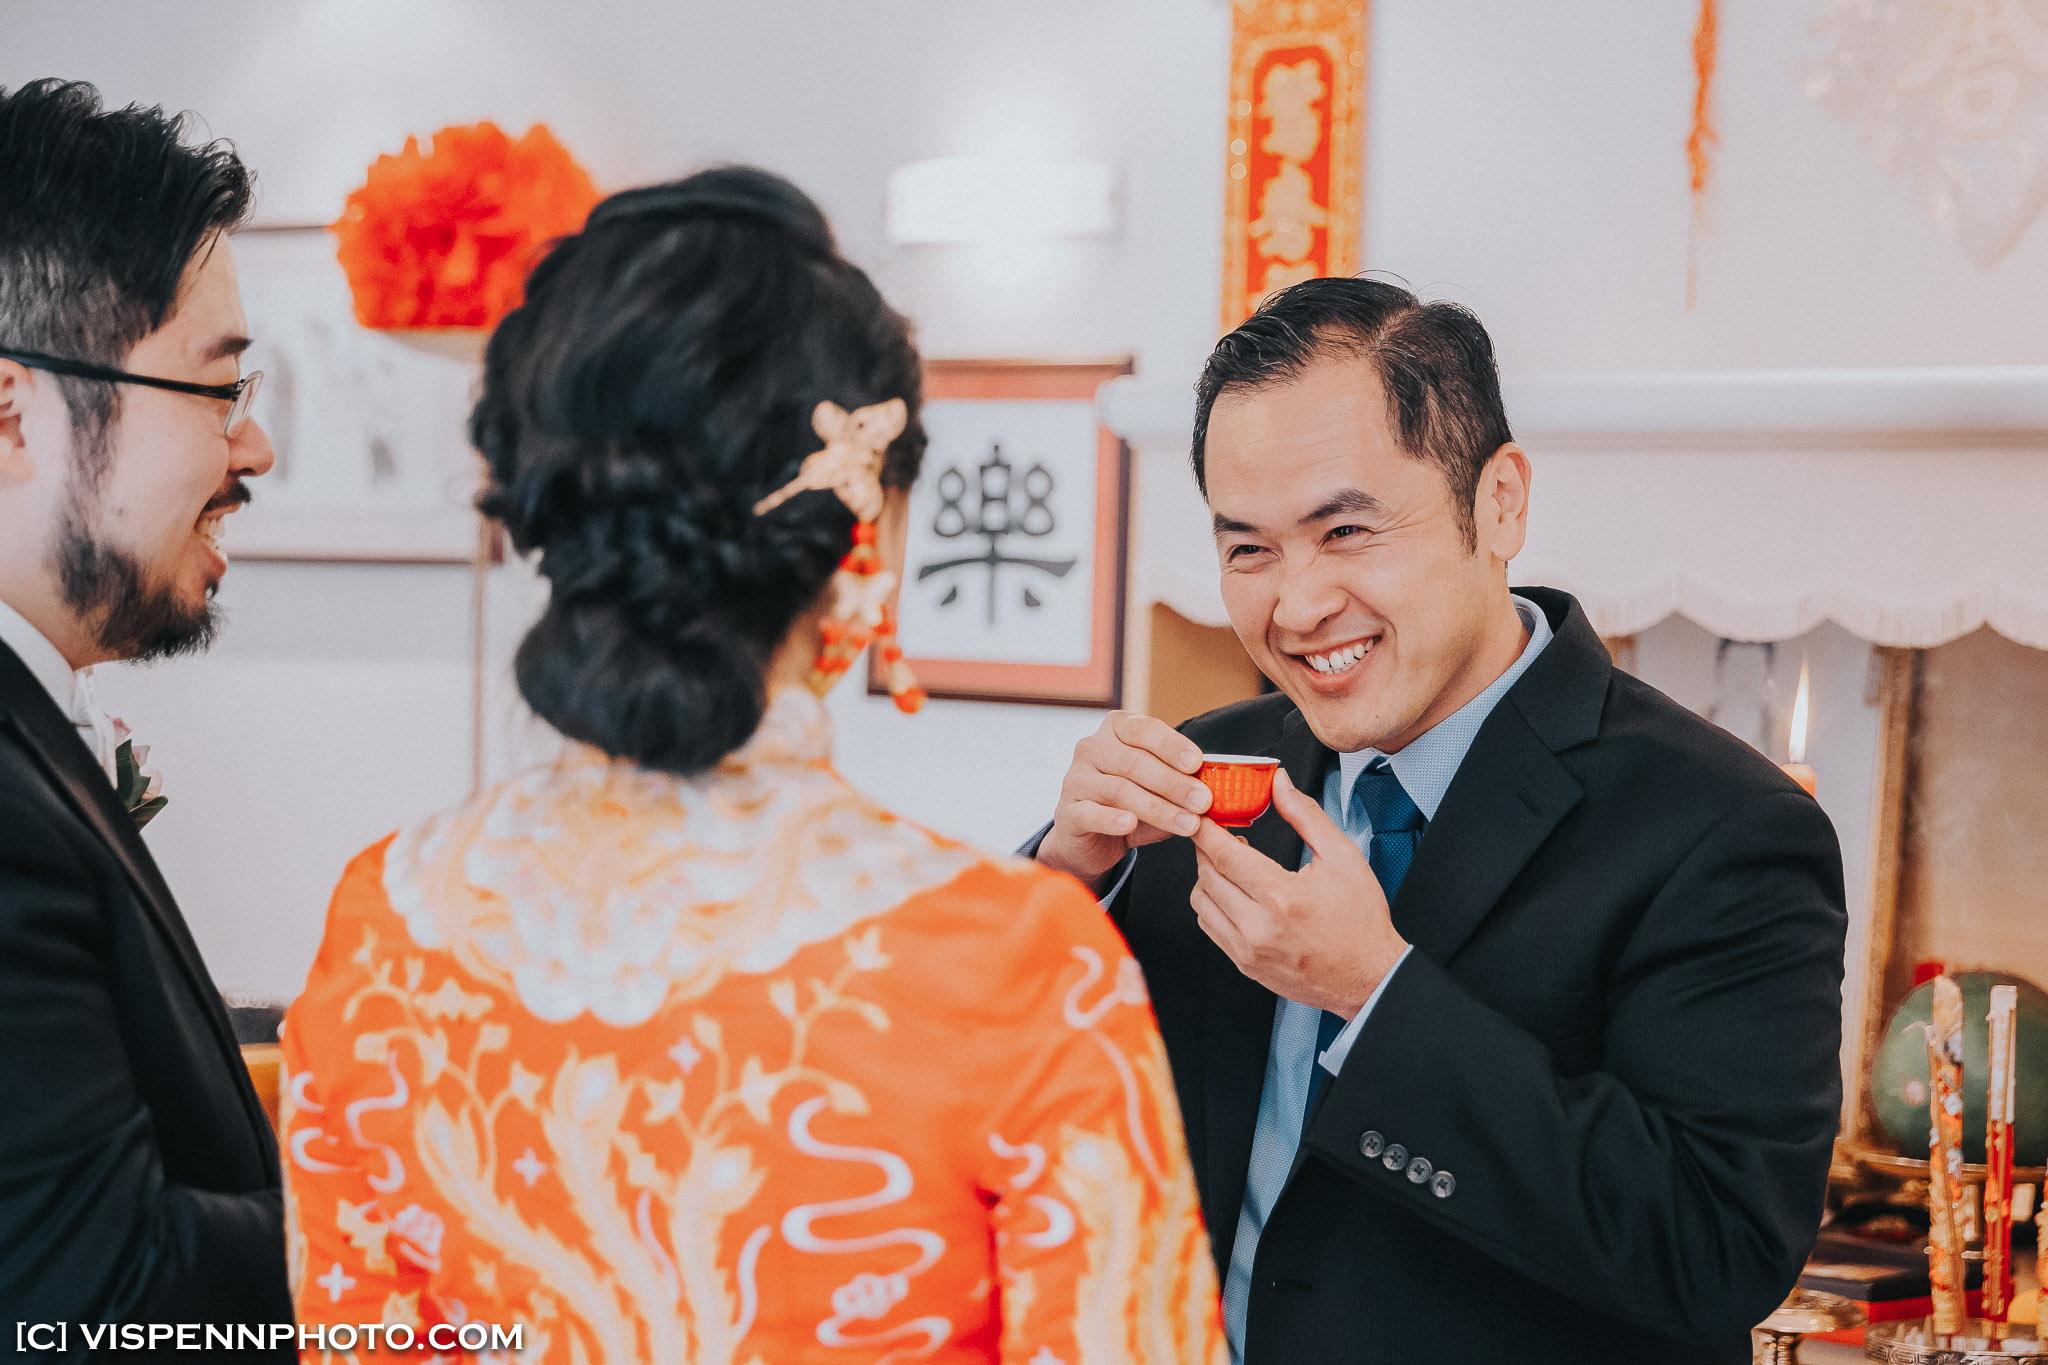 WEDDING DAY Photography Melbourne VISPENN 墨尔本 婚礼跟拍 婚礼摄像 婚礼摄影 结婚照 登记照 1DX 2213